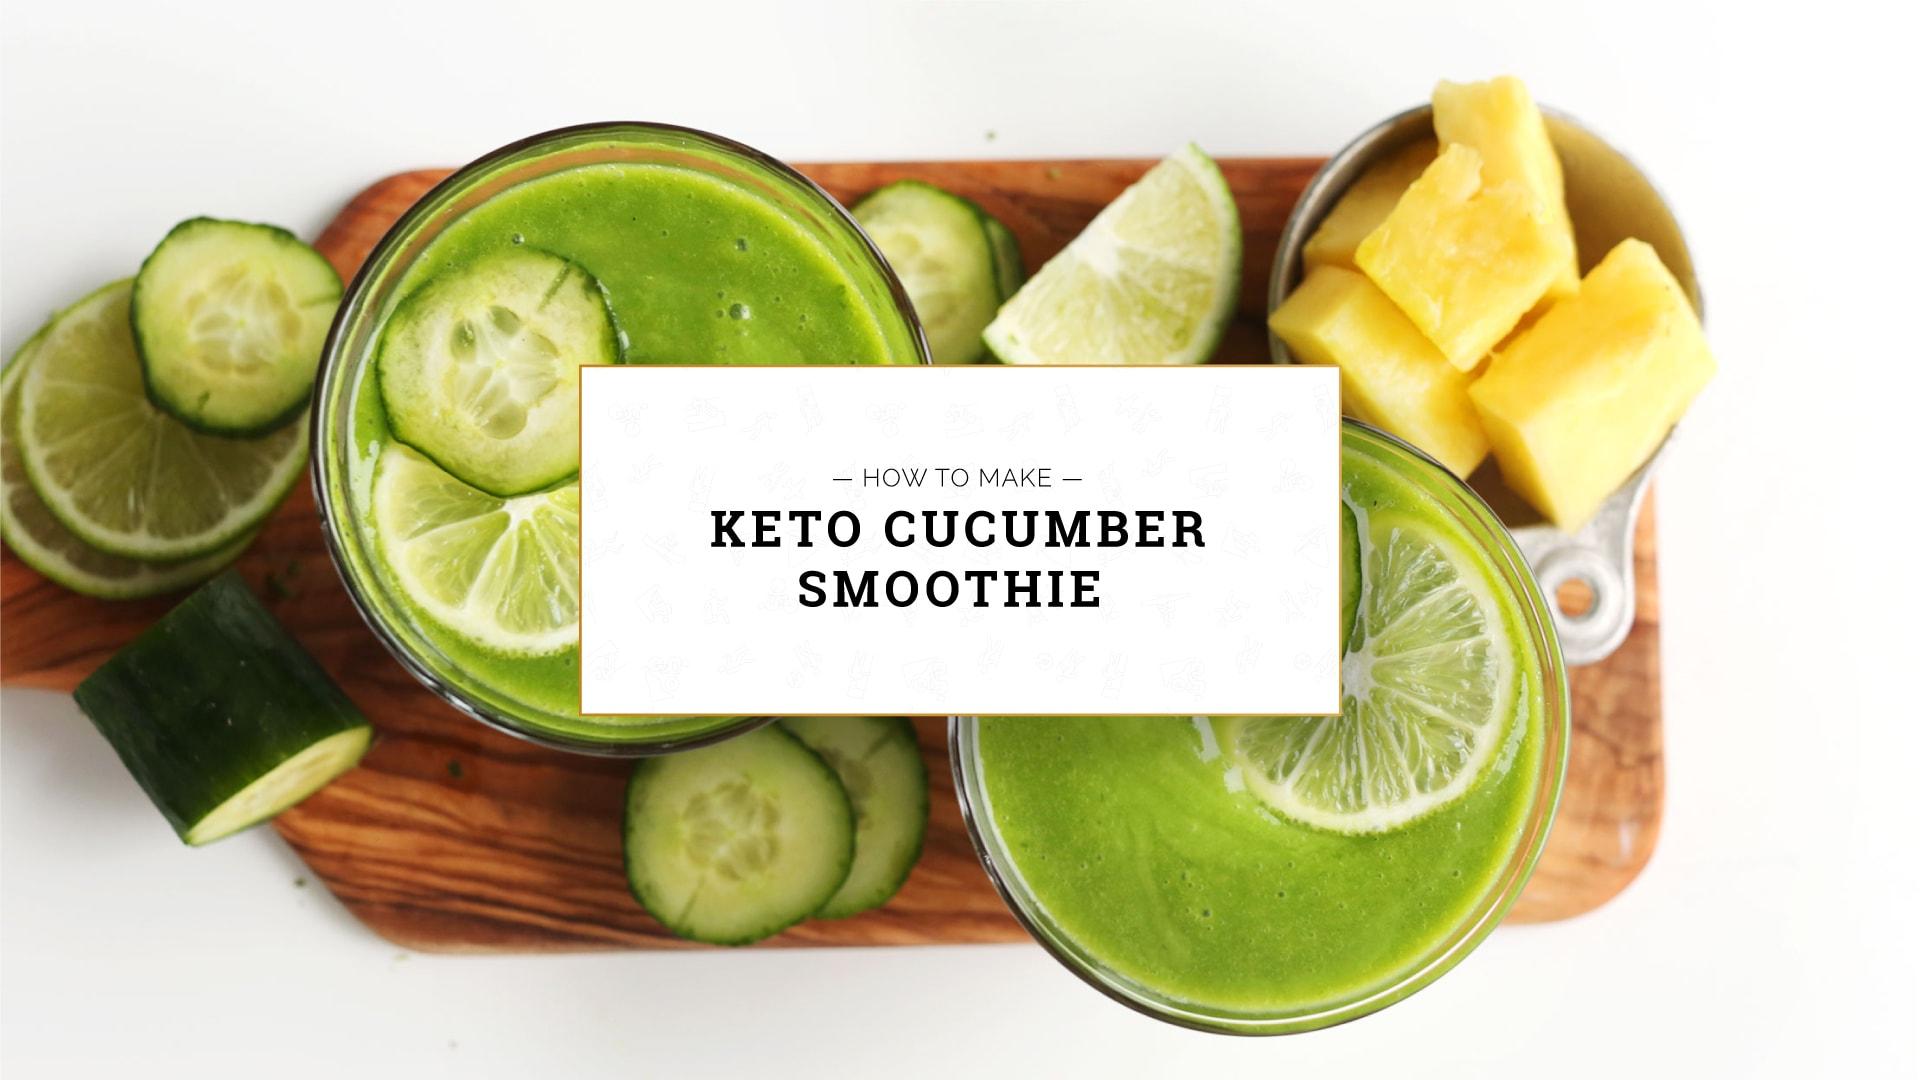 Keto Cucumber Smoothie